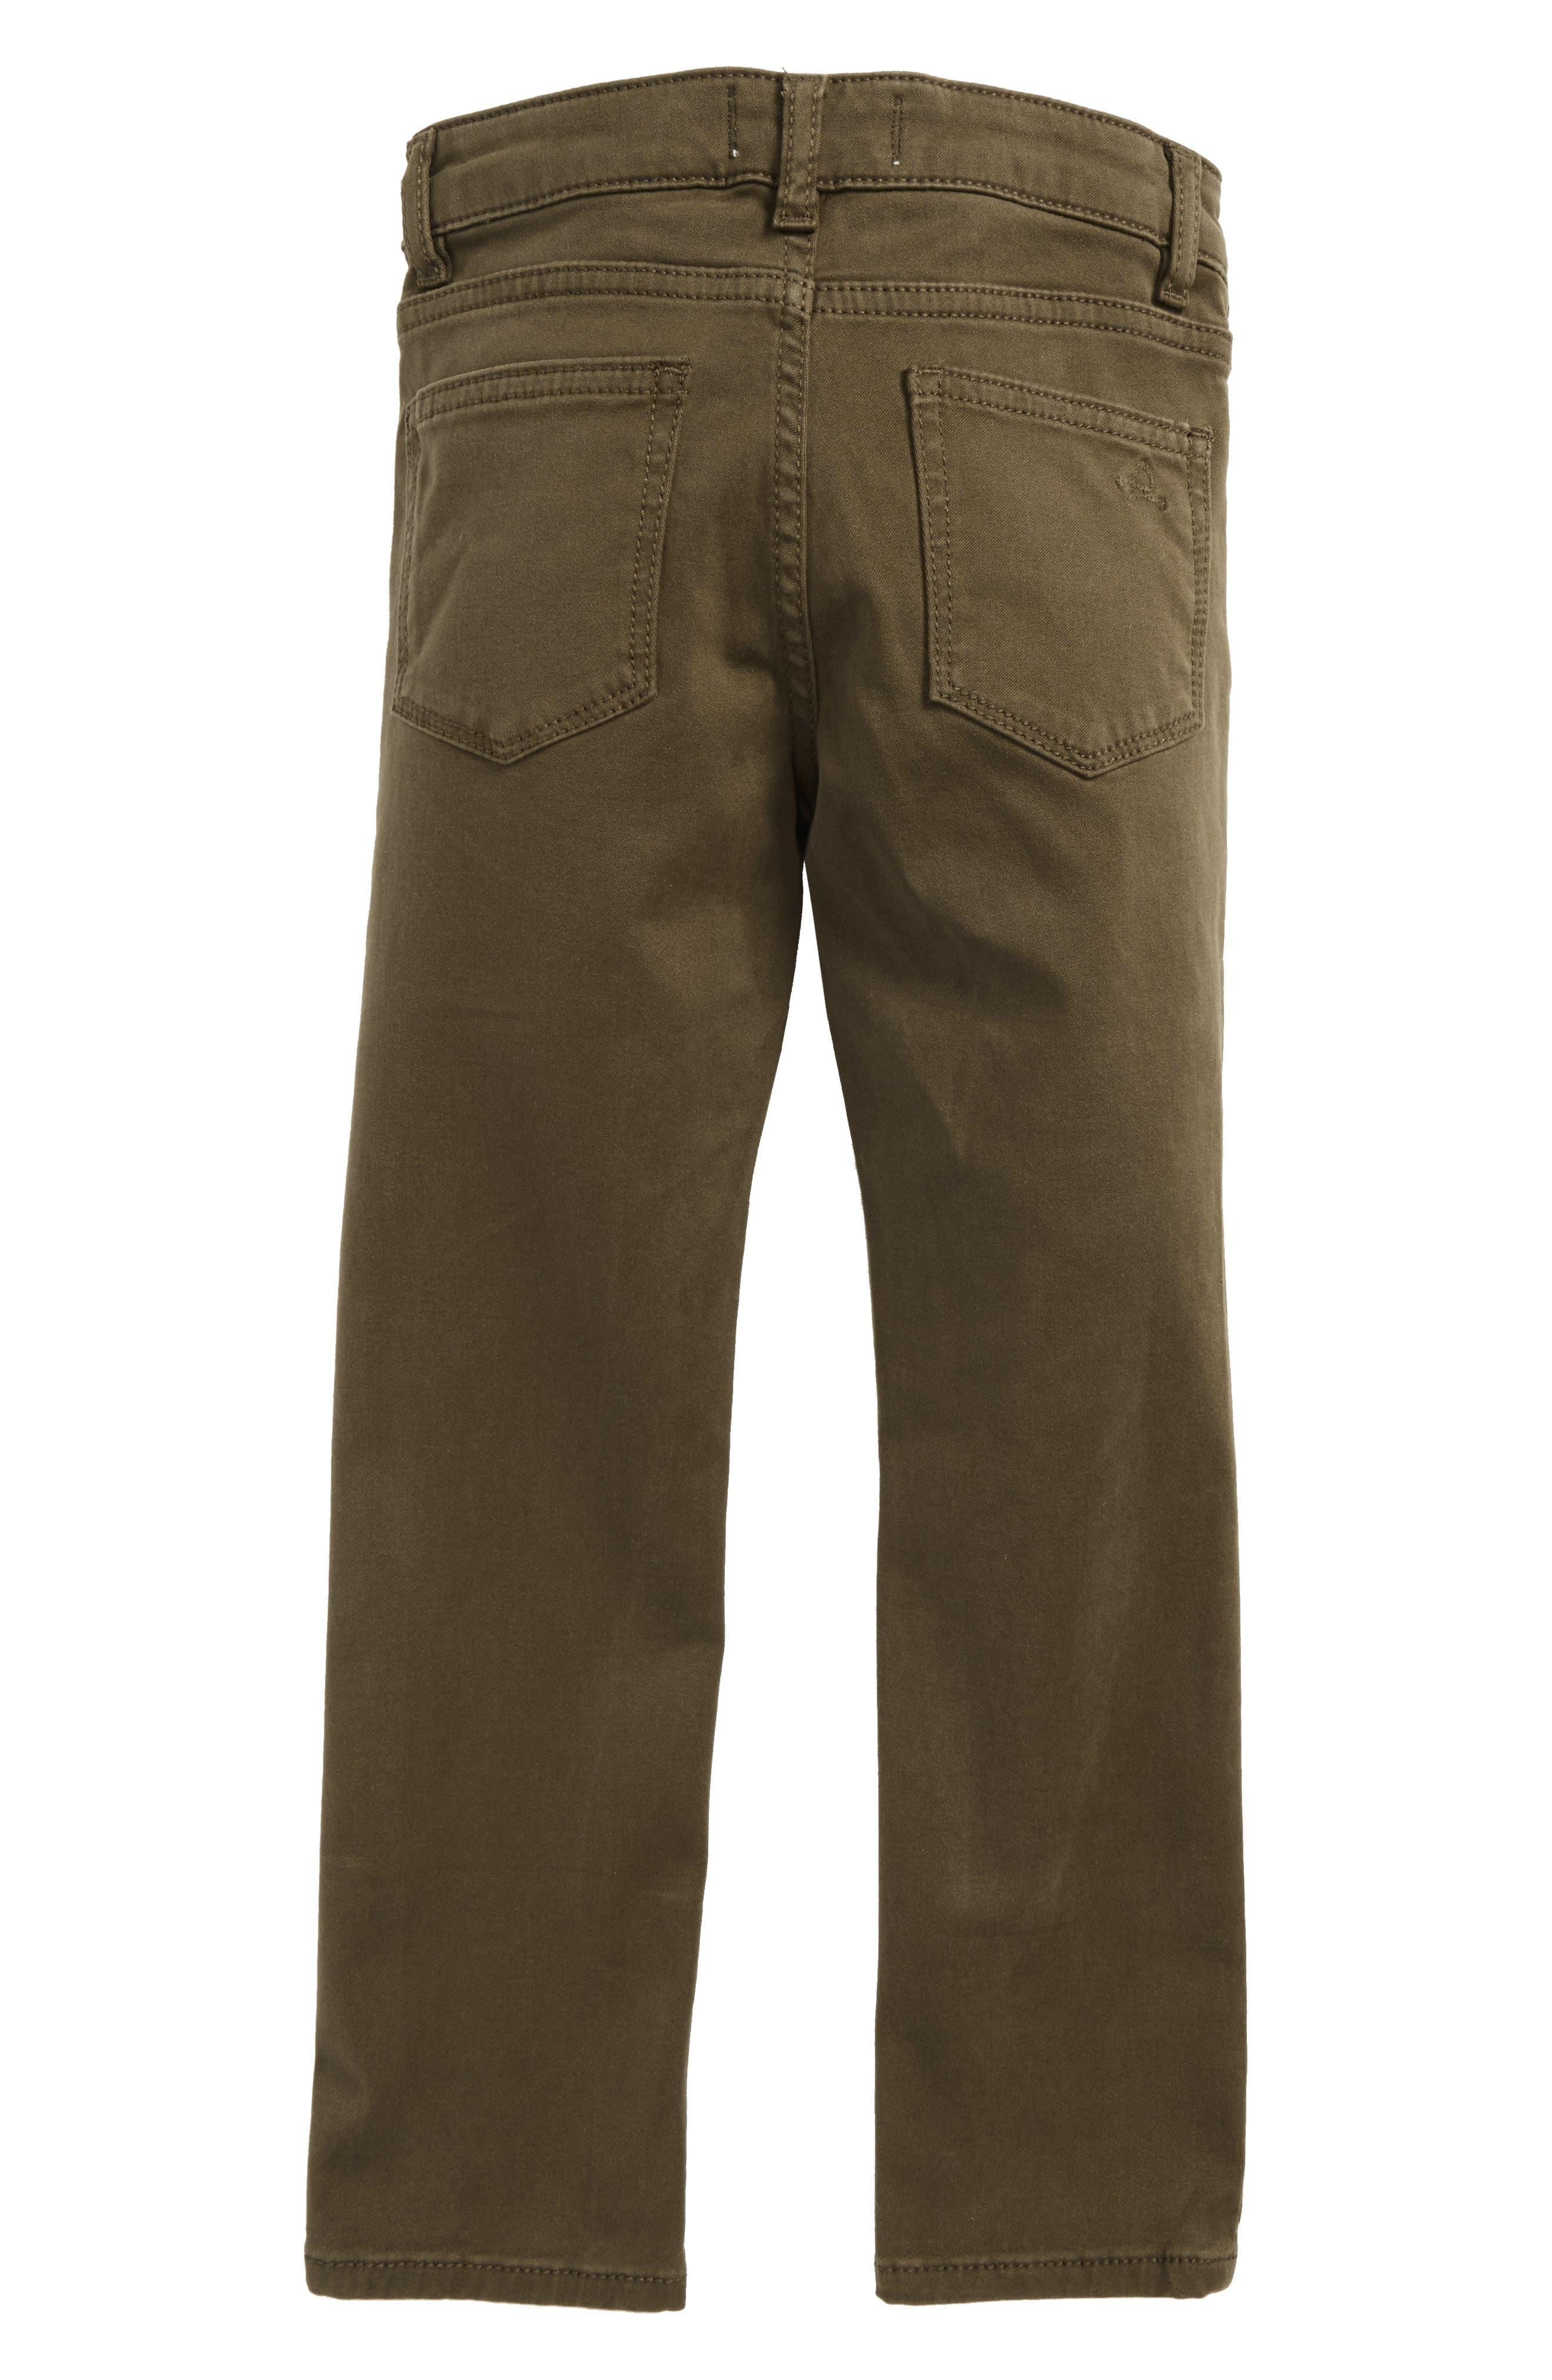 Brady Slim Fit Twill Pants,                             Alternate thumbnail 2, color,                             300